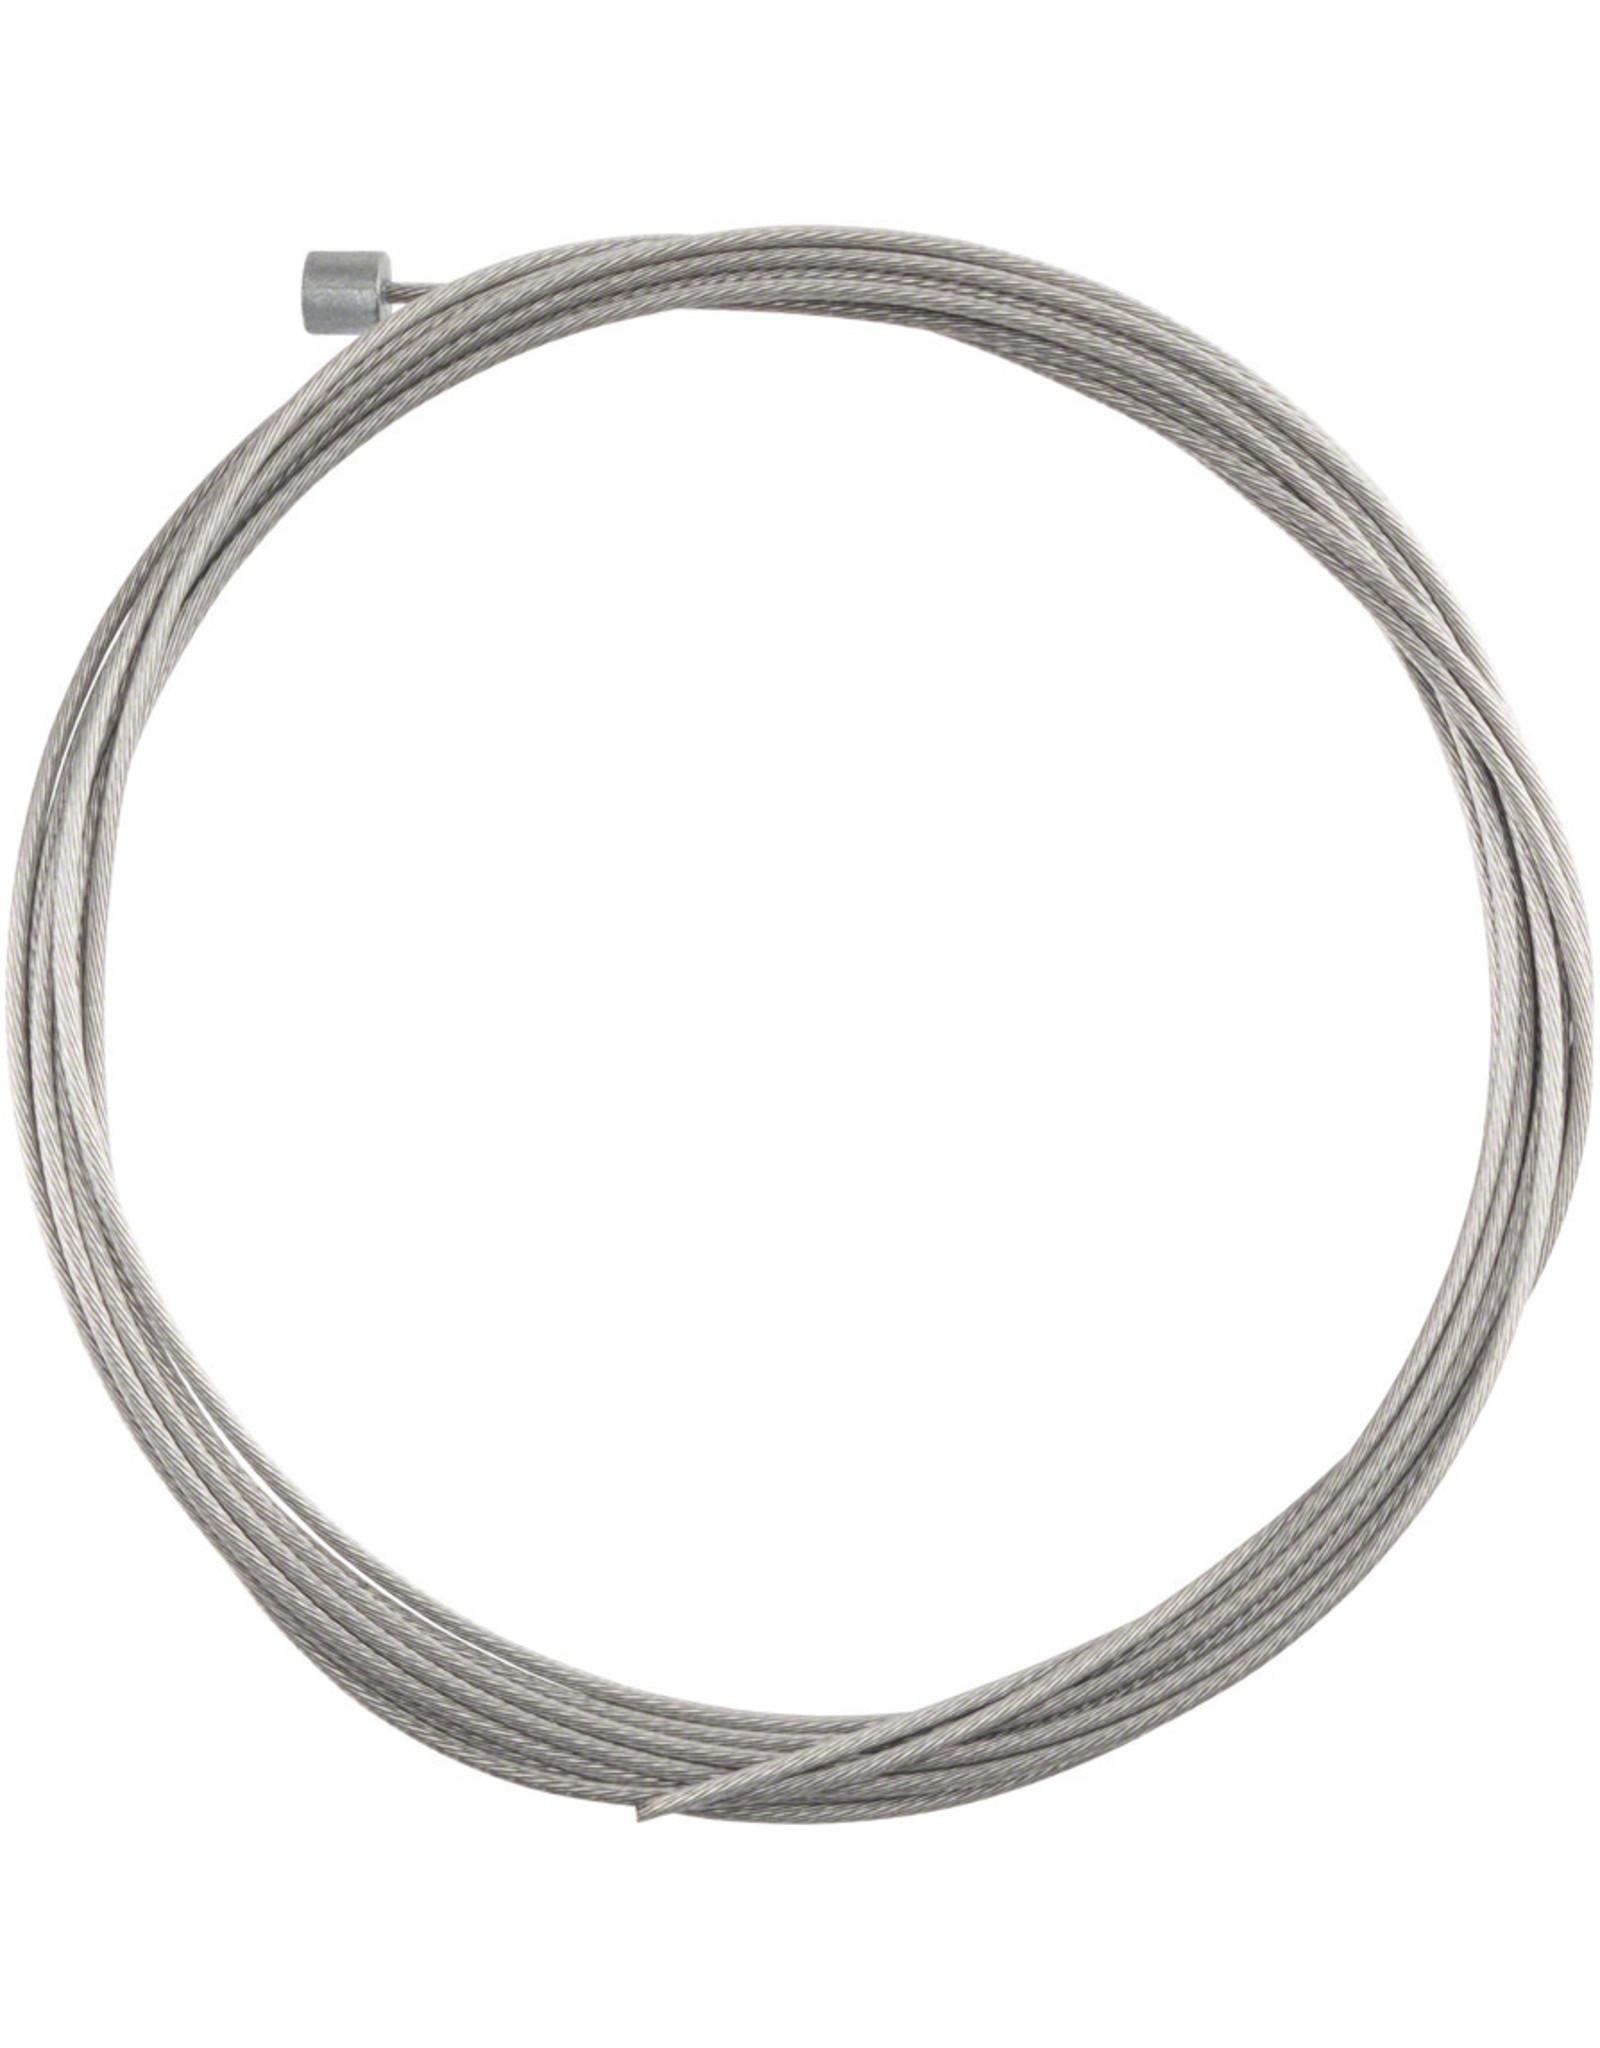 Jagwire Jagwire Slick Stainless Derailleur Wire, 2300mm Shimano Head